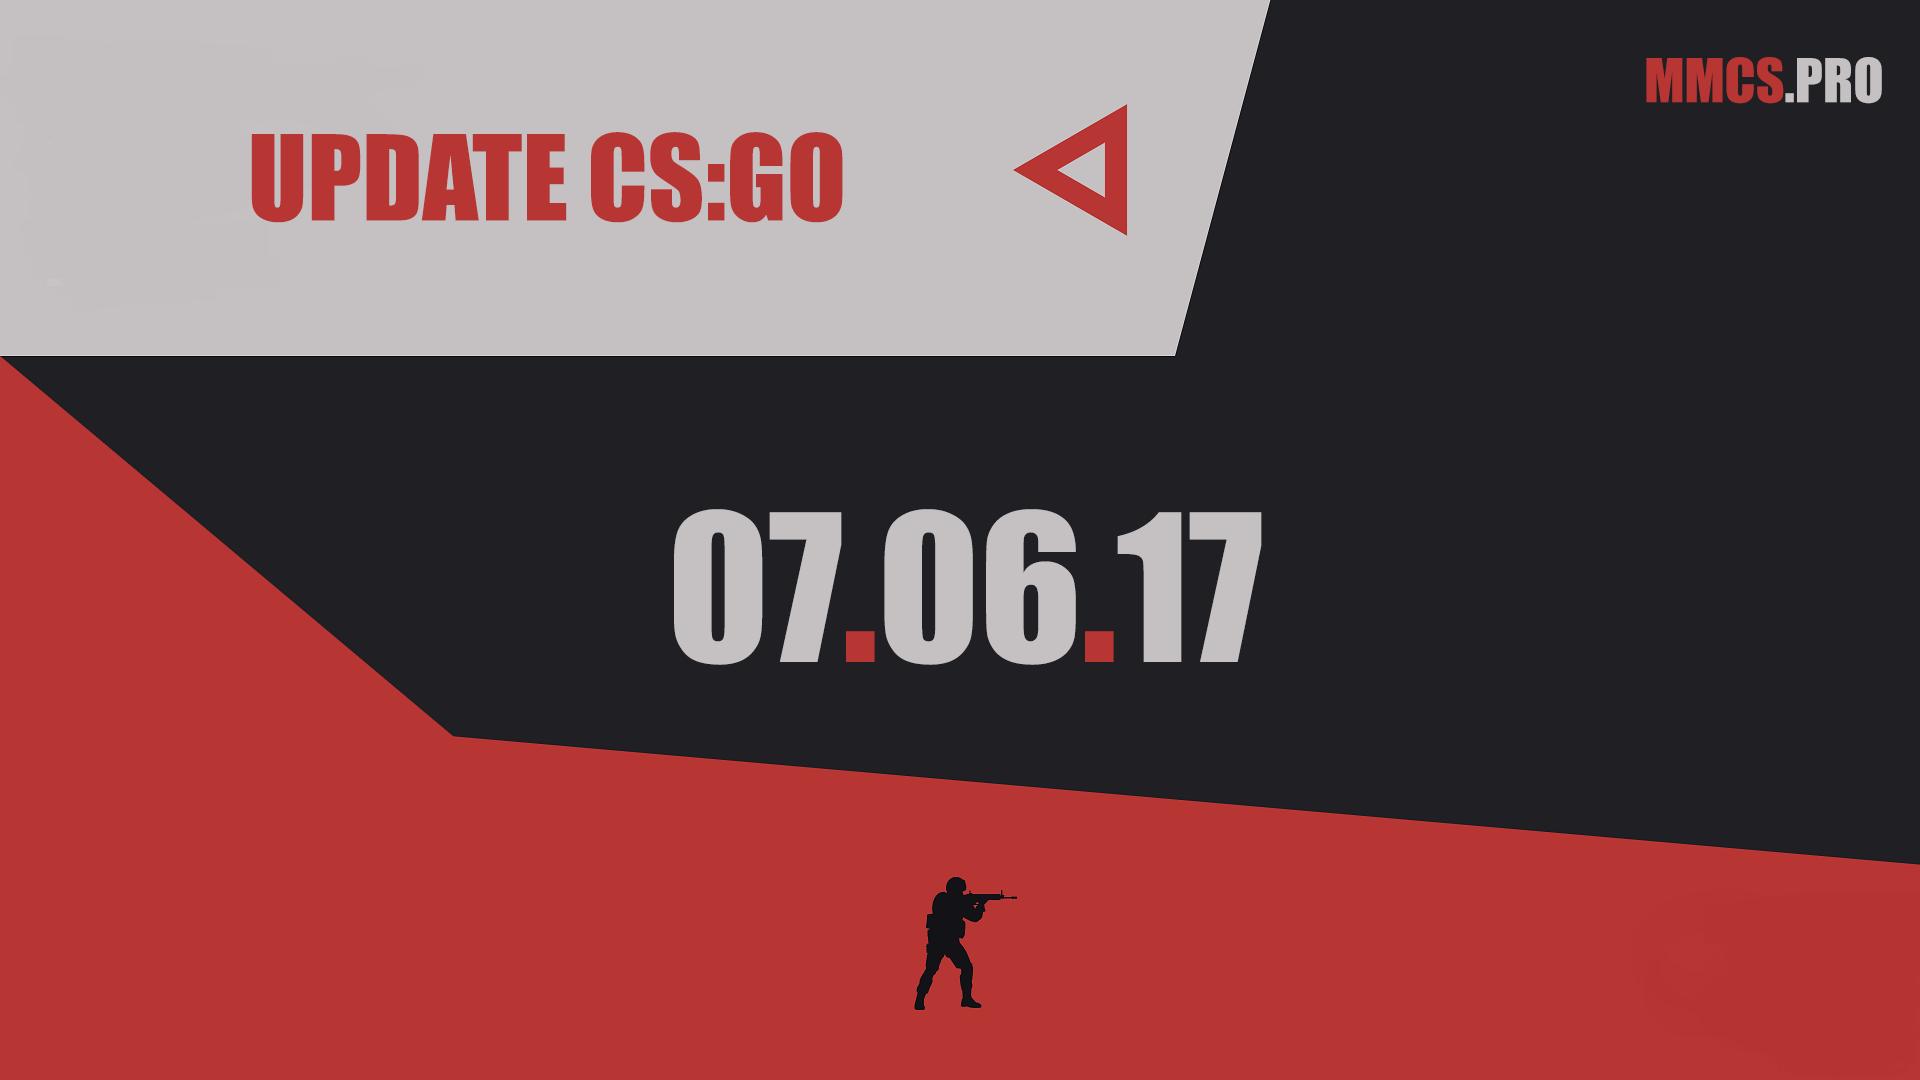 https://mmcs.pro/update-csgo-07-06-2017-valve/